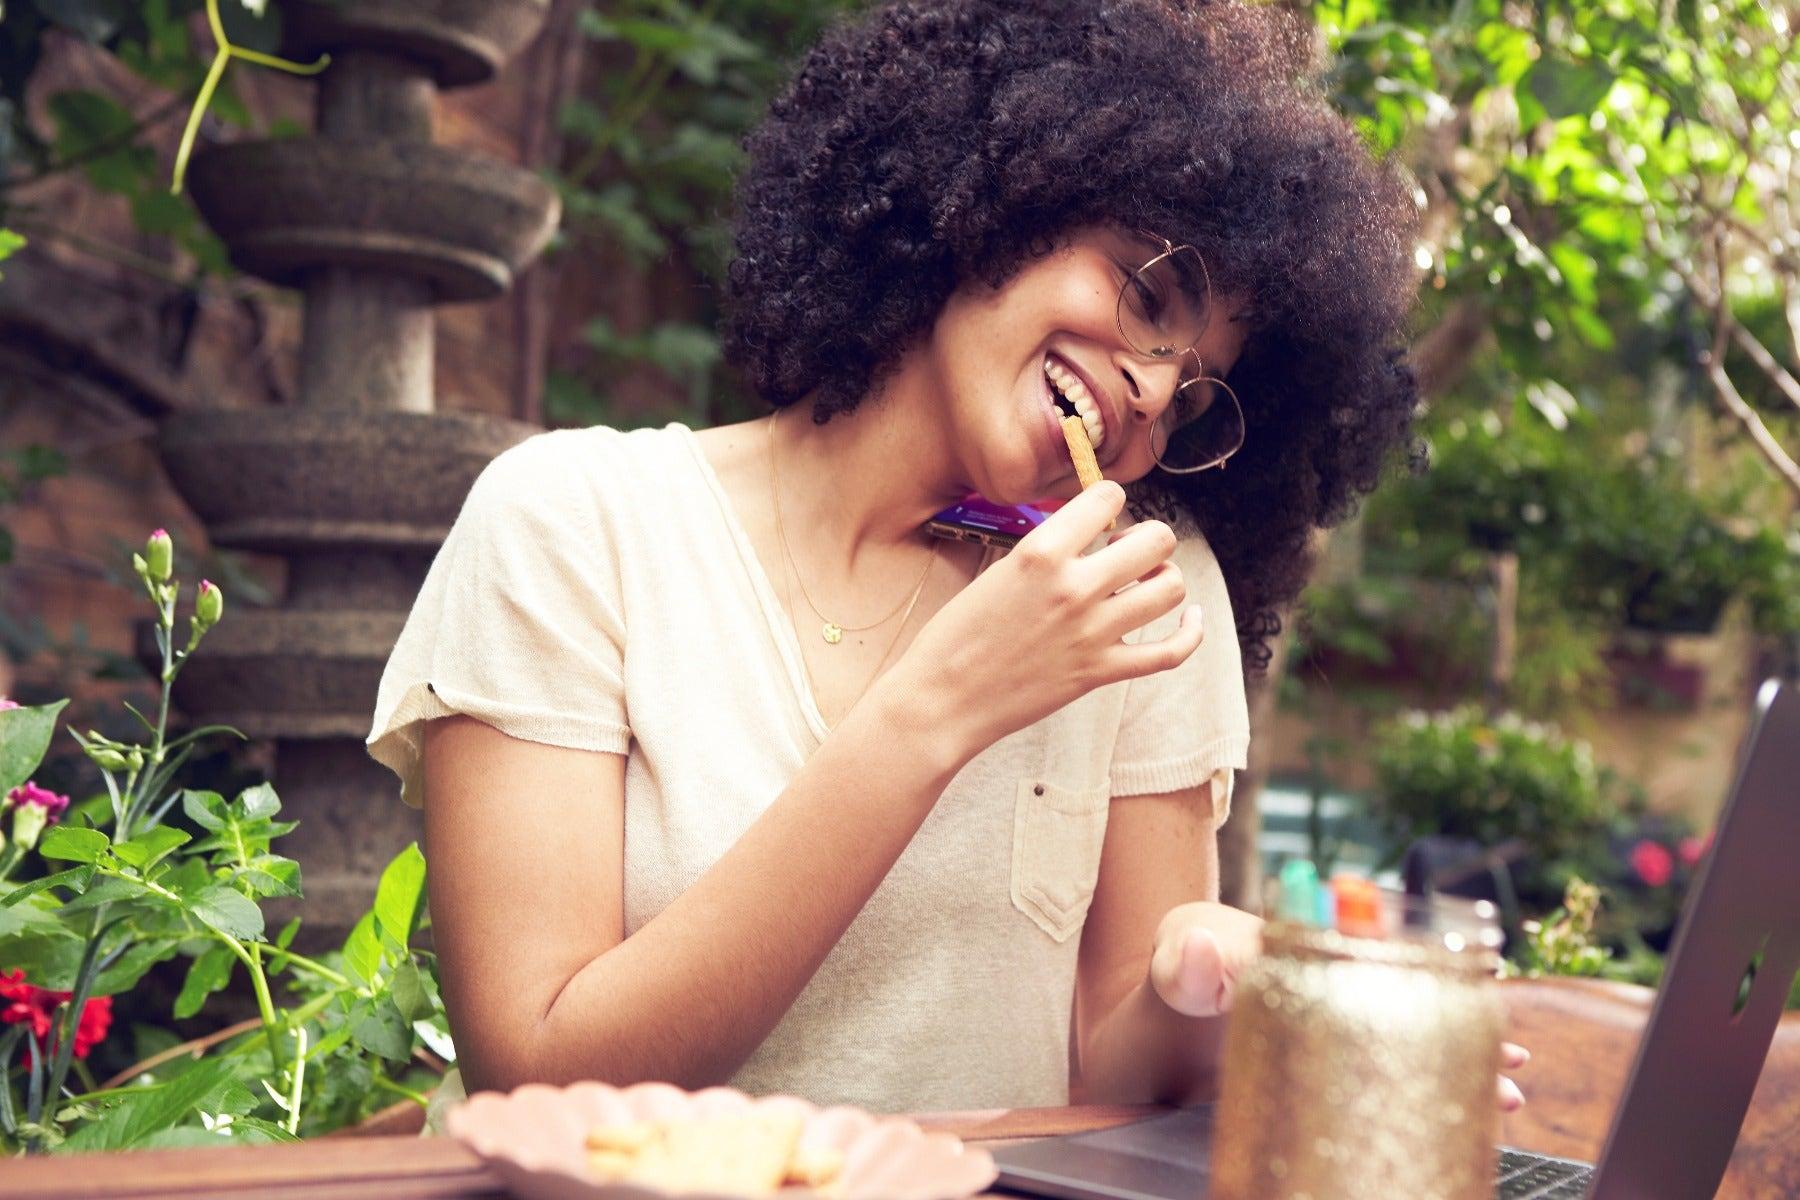 Femme qui mange un biscuit en terrasse